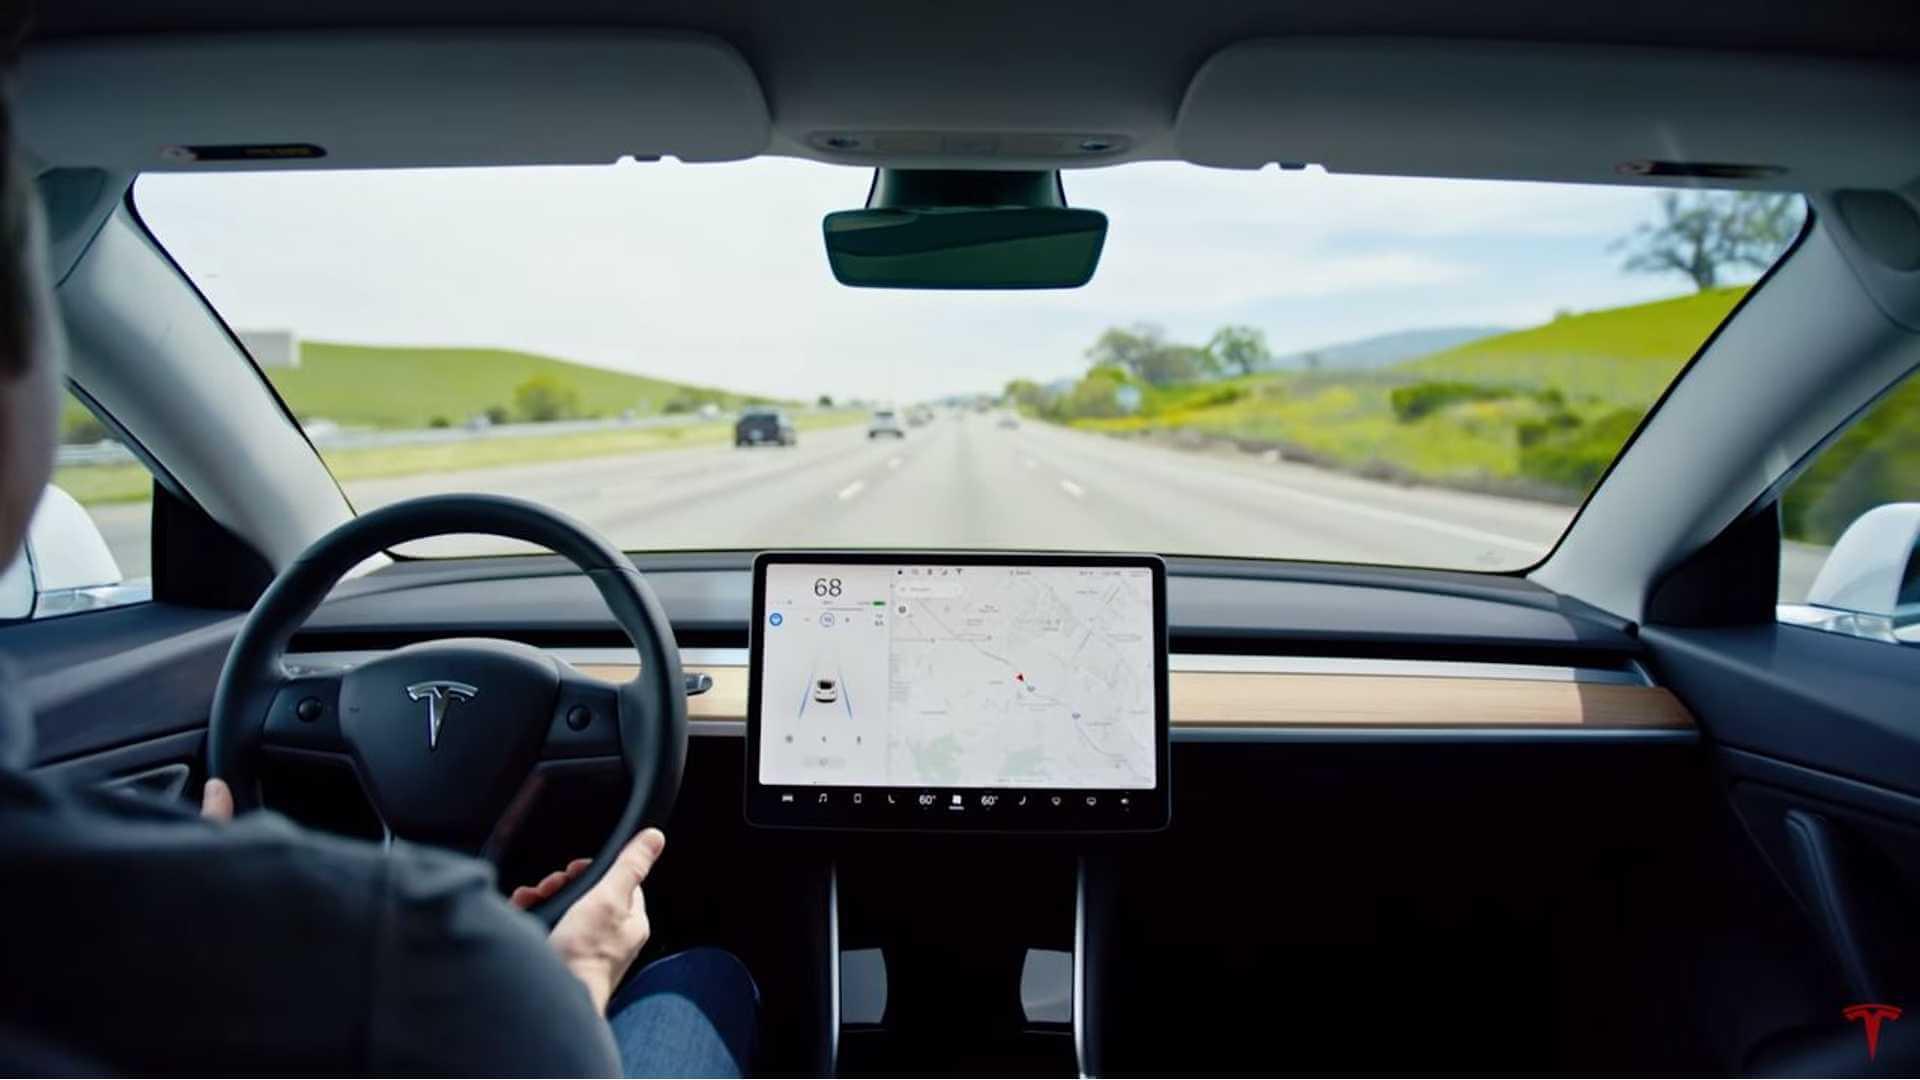 Подписка на Tesla FSD может появиться во втором квартале - Tesla Motors Club